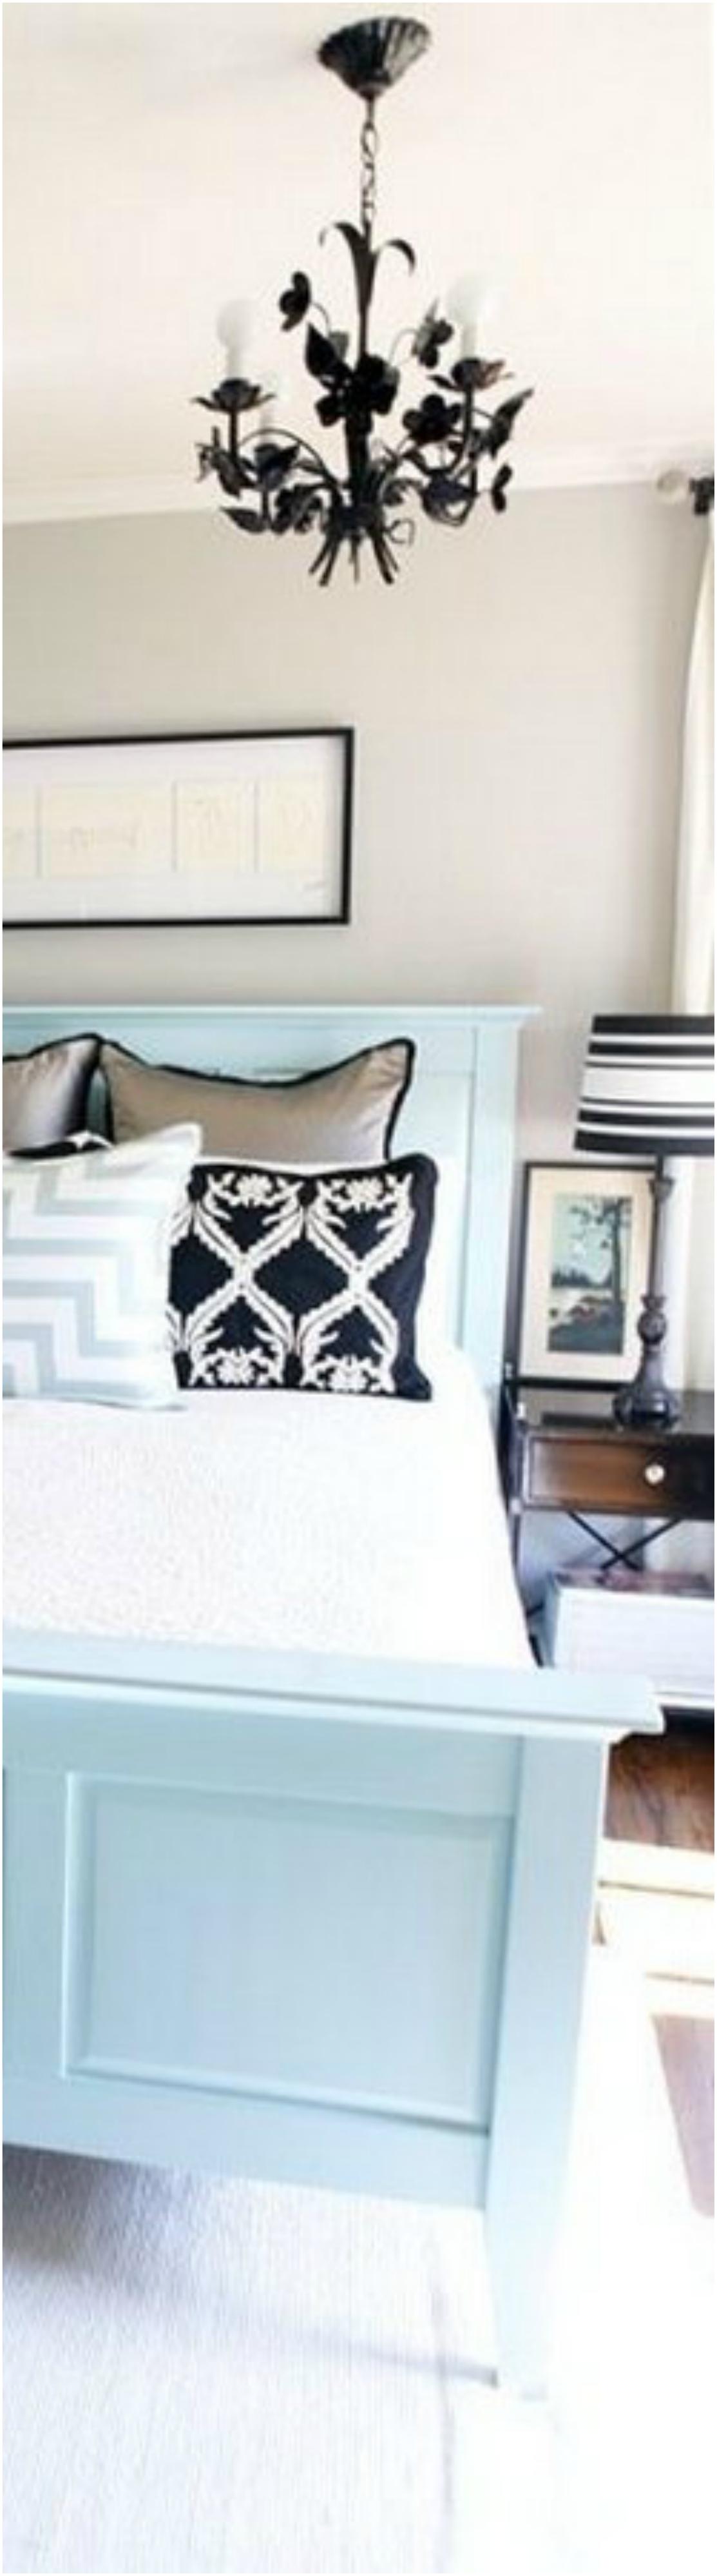 small bedroom design (46)